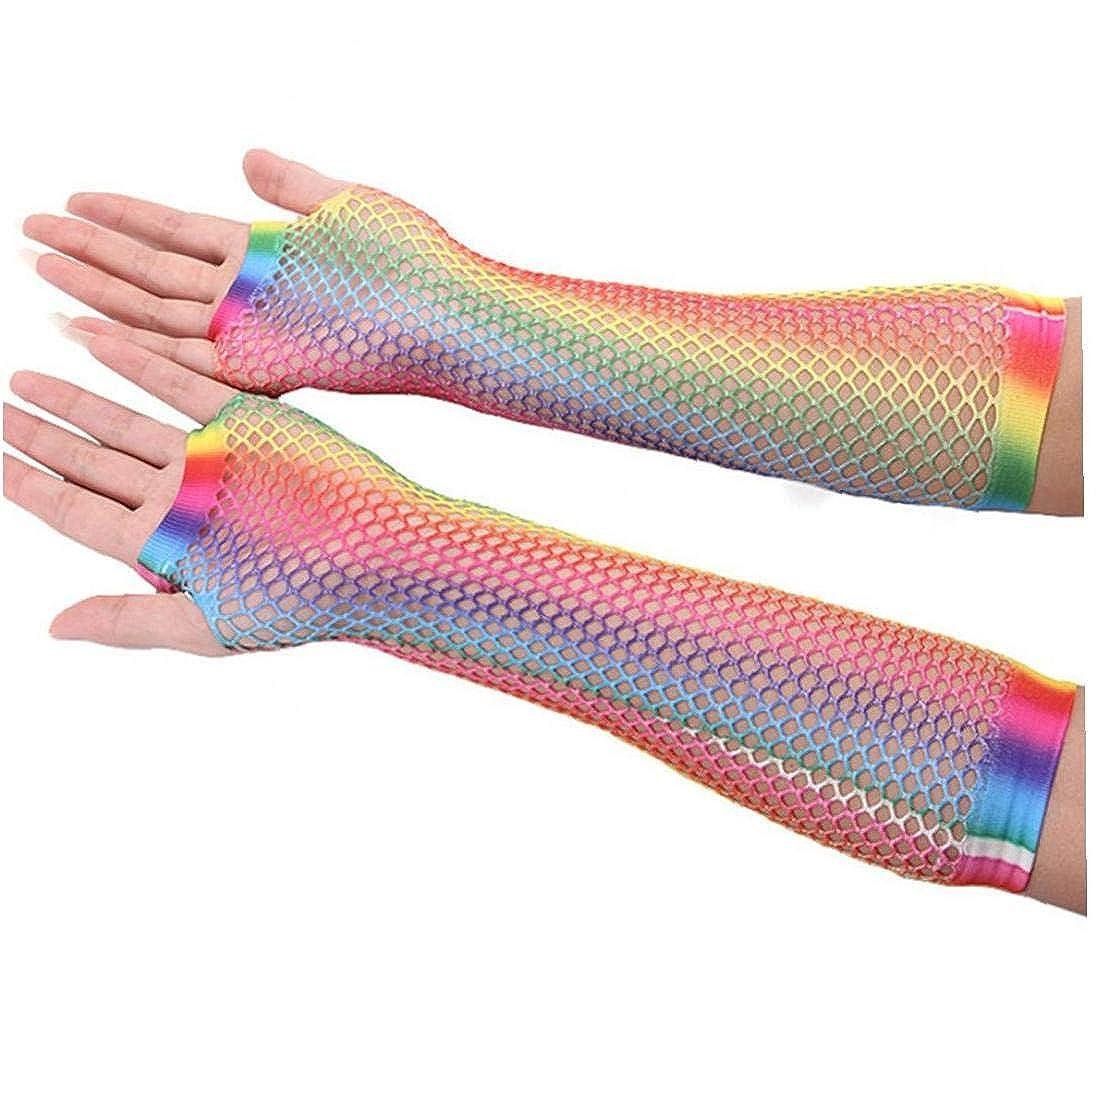 1 Paio Femmine Hollow I Fori Guanti Arcobaleno Stampato Senza Dita Mesh Gloves a Rete